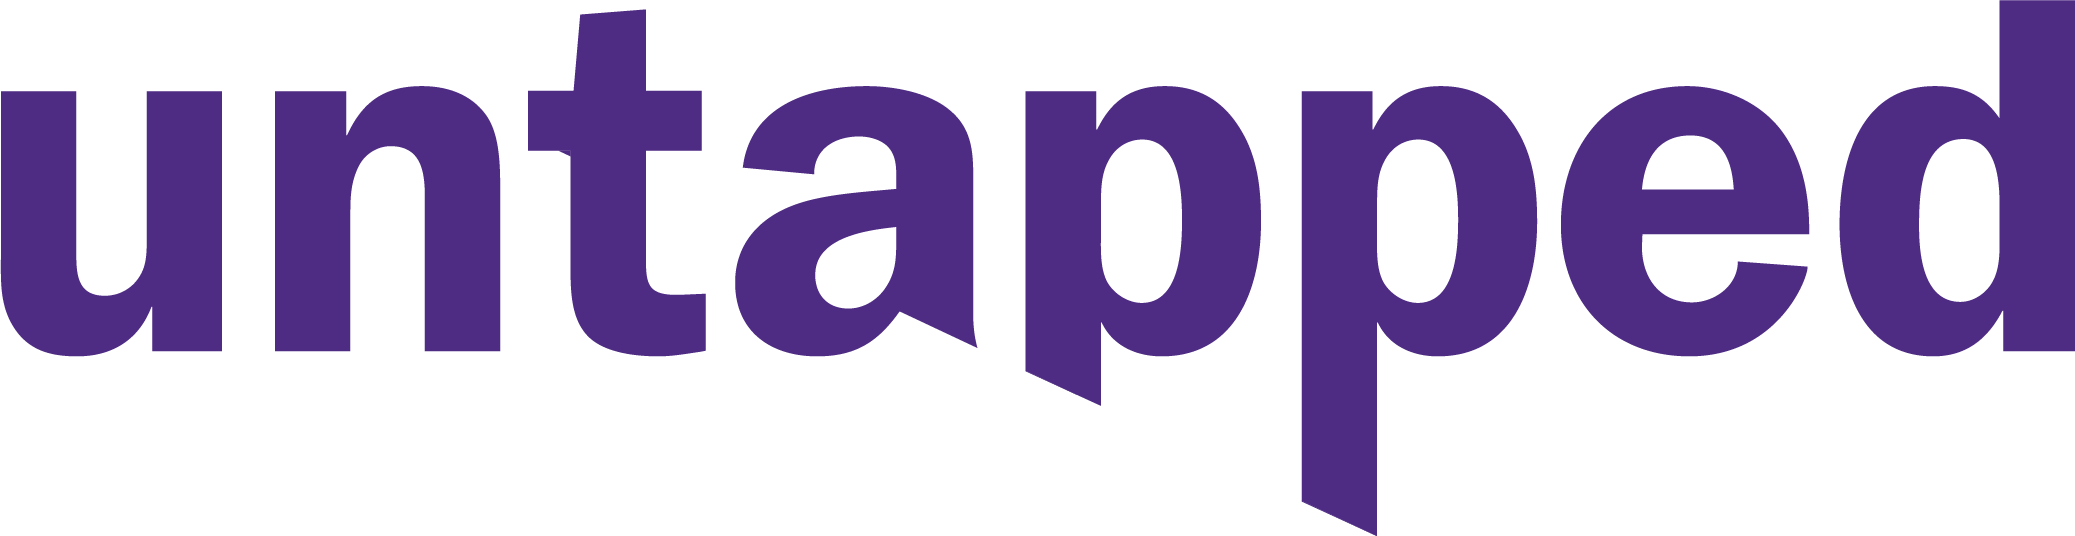 Friendli logo